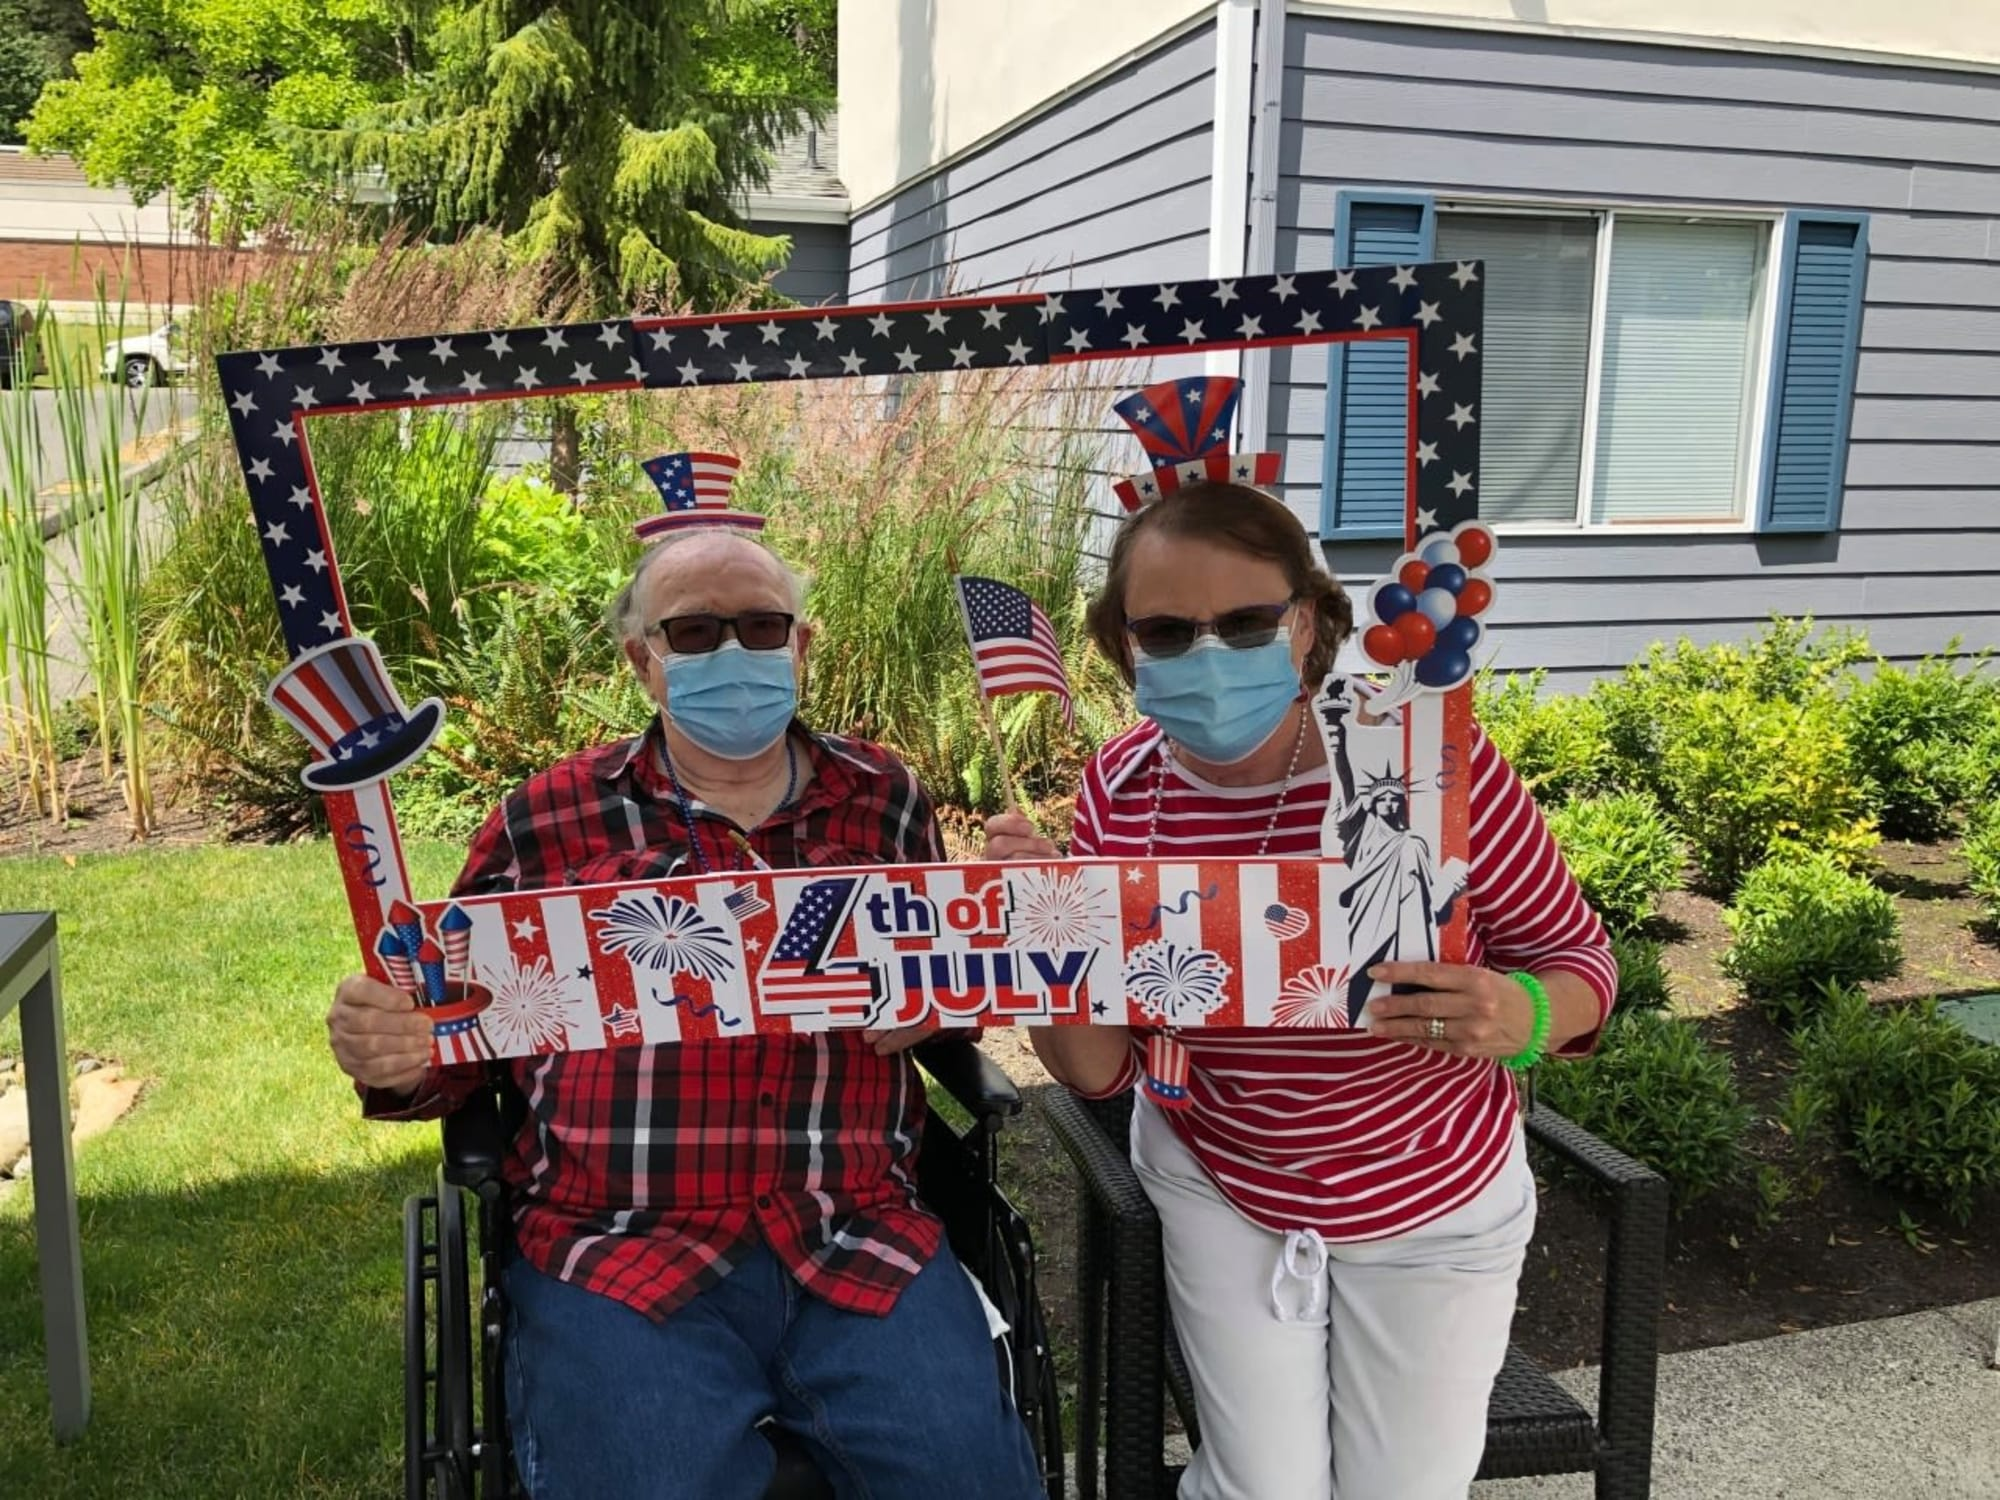 Fourth of July at Mountlake Terrace Plaza in Mountlake Terrace, Washington